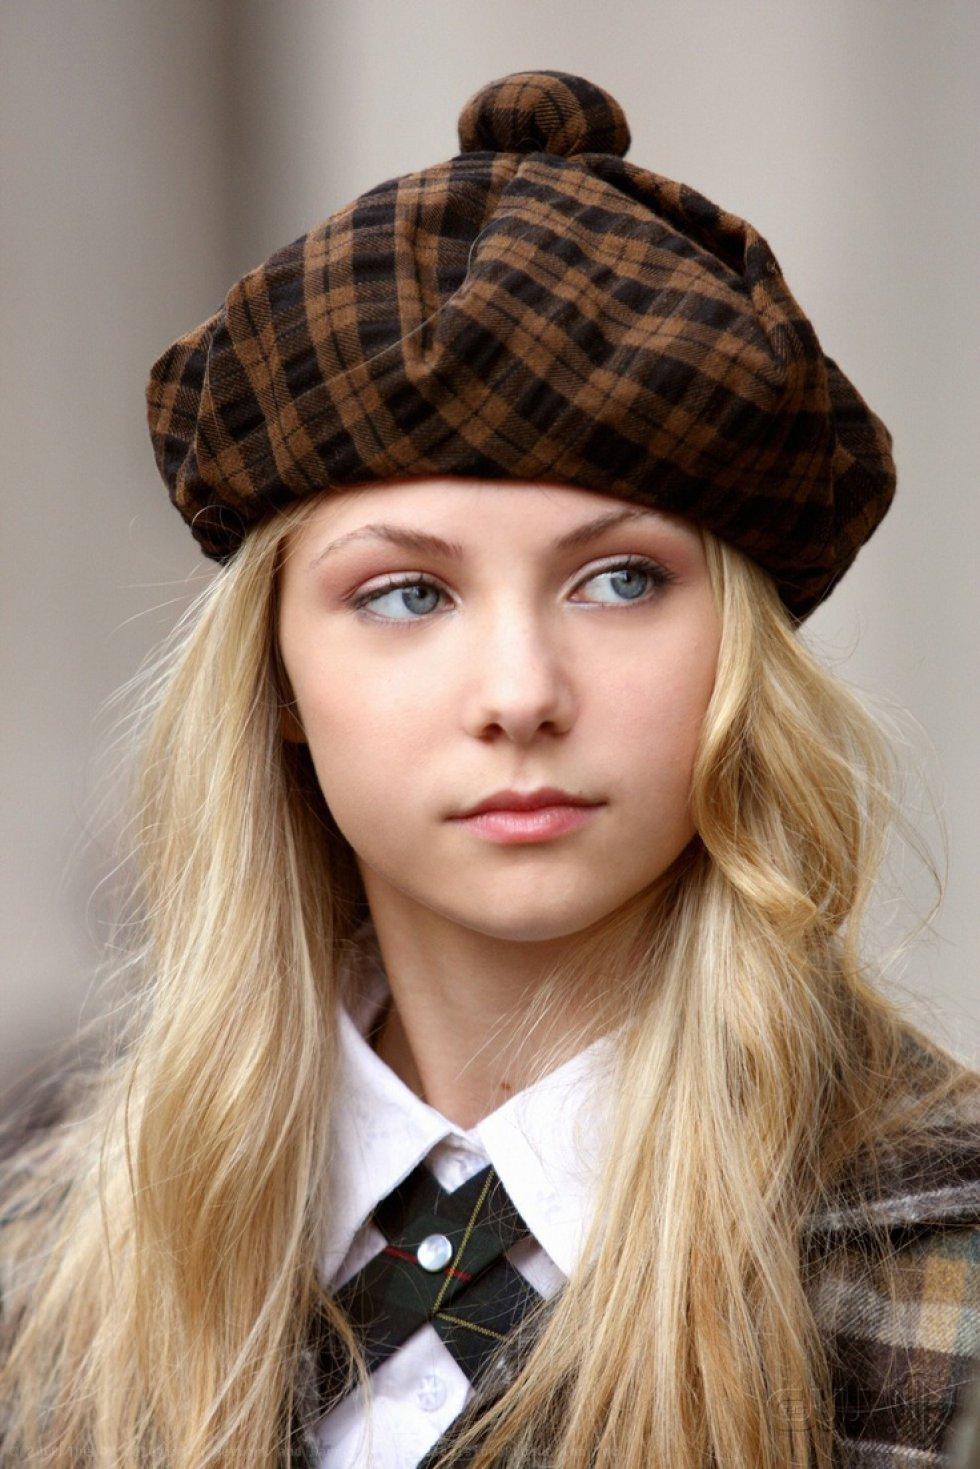 Personagens de Gossip Girl: Jhenny Humphrey - PAPICHER Taylor Momsen